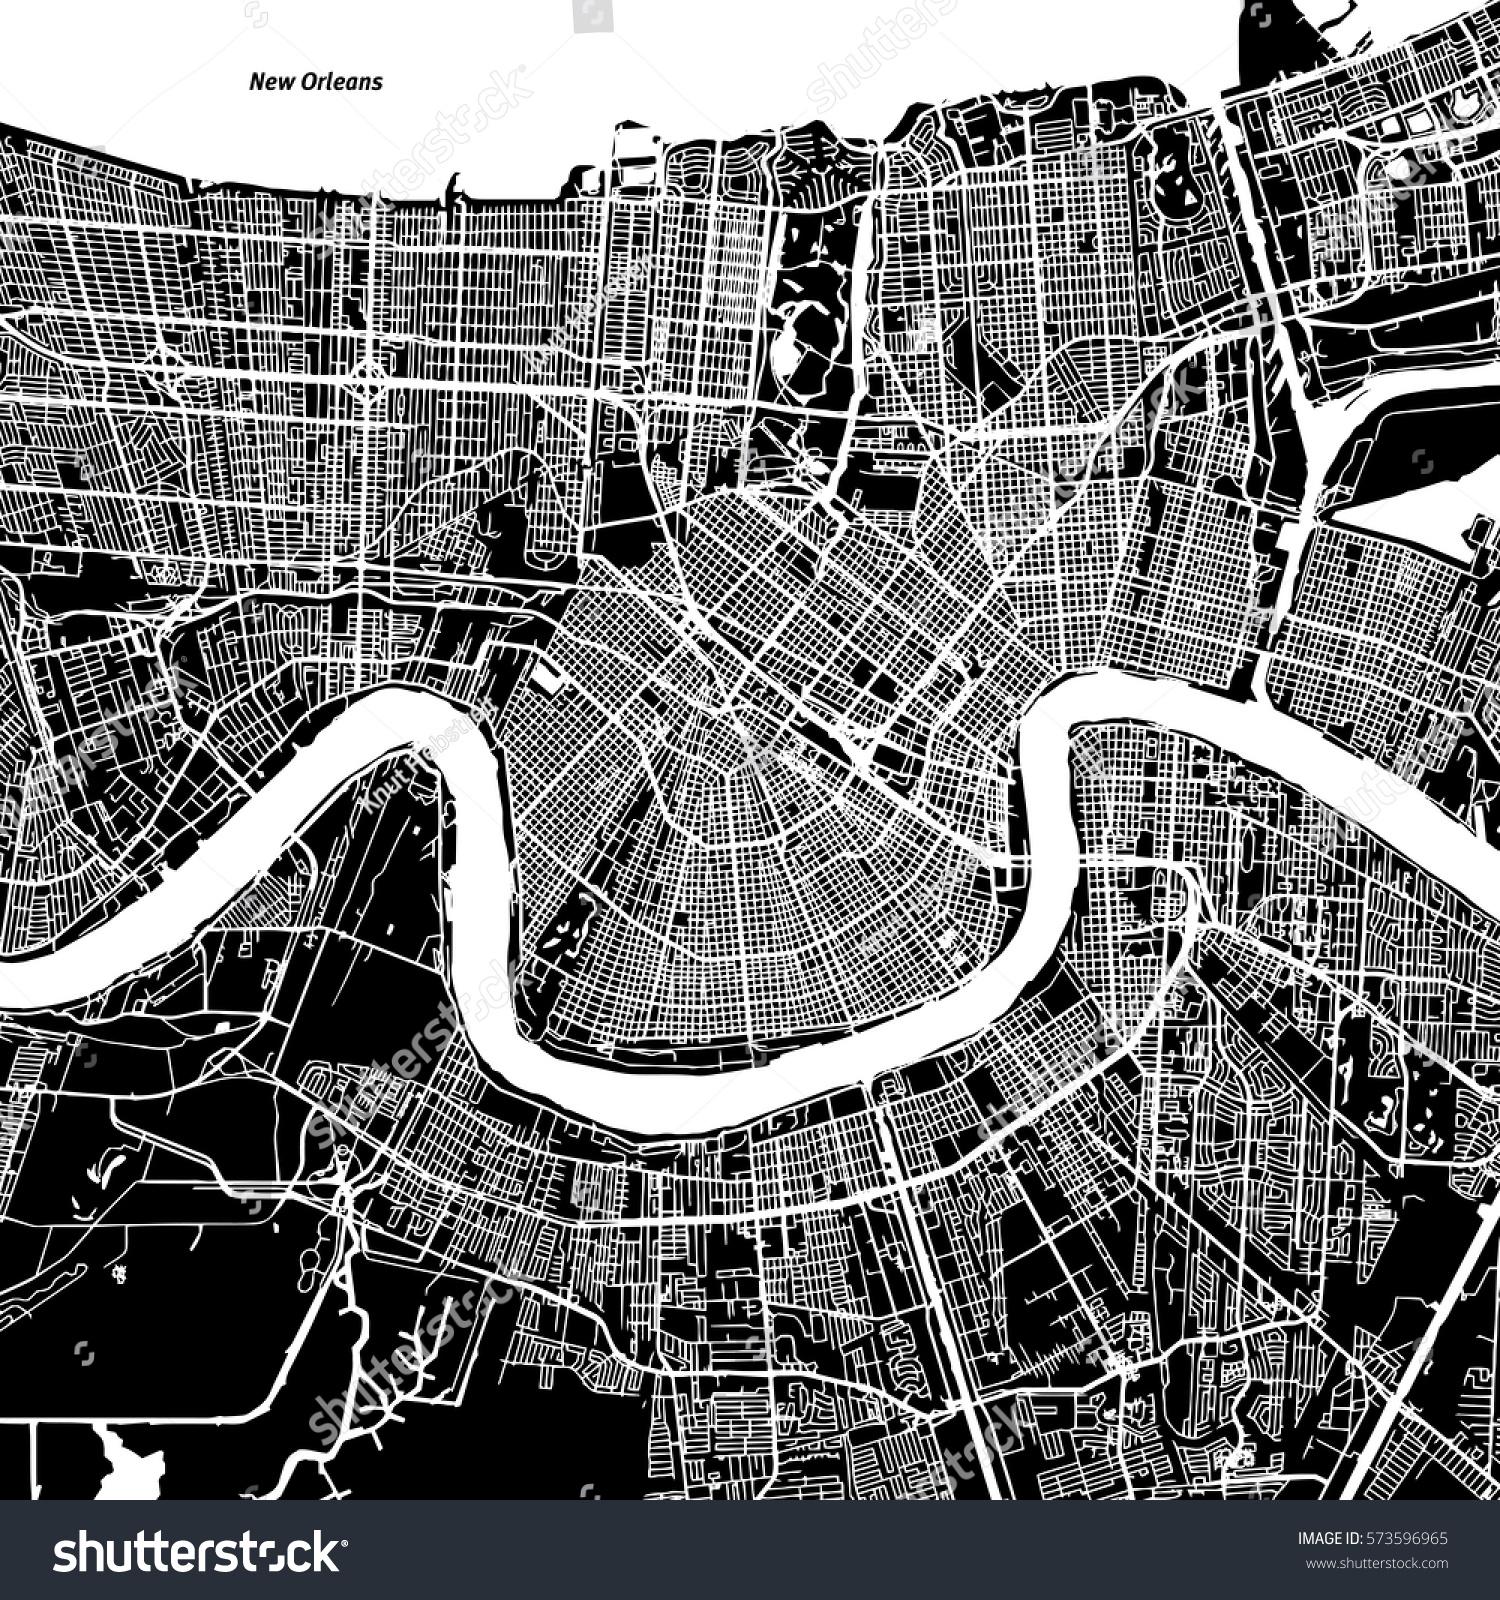 New Orleans Vector Map Artprint Black Stock Vector (Royalty